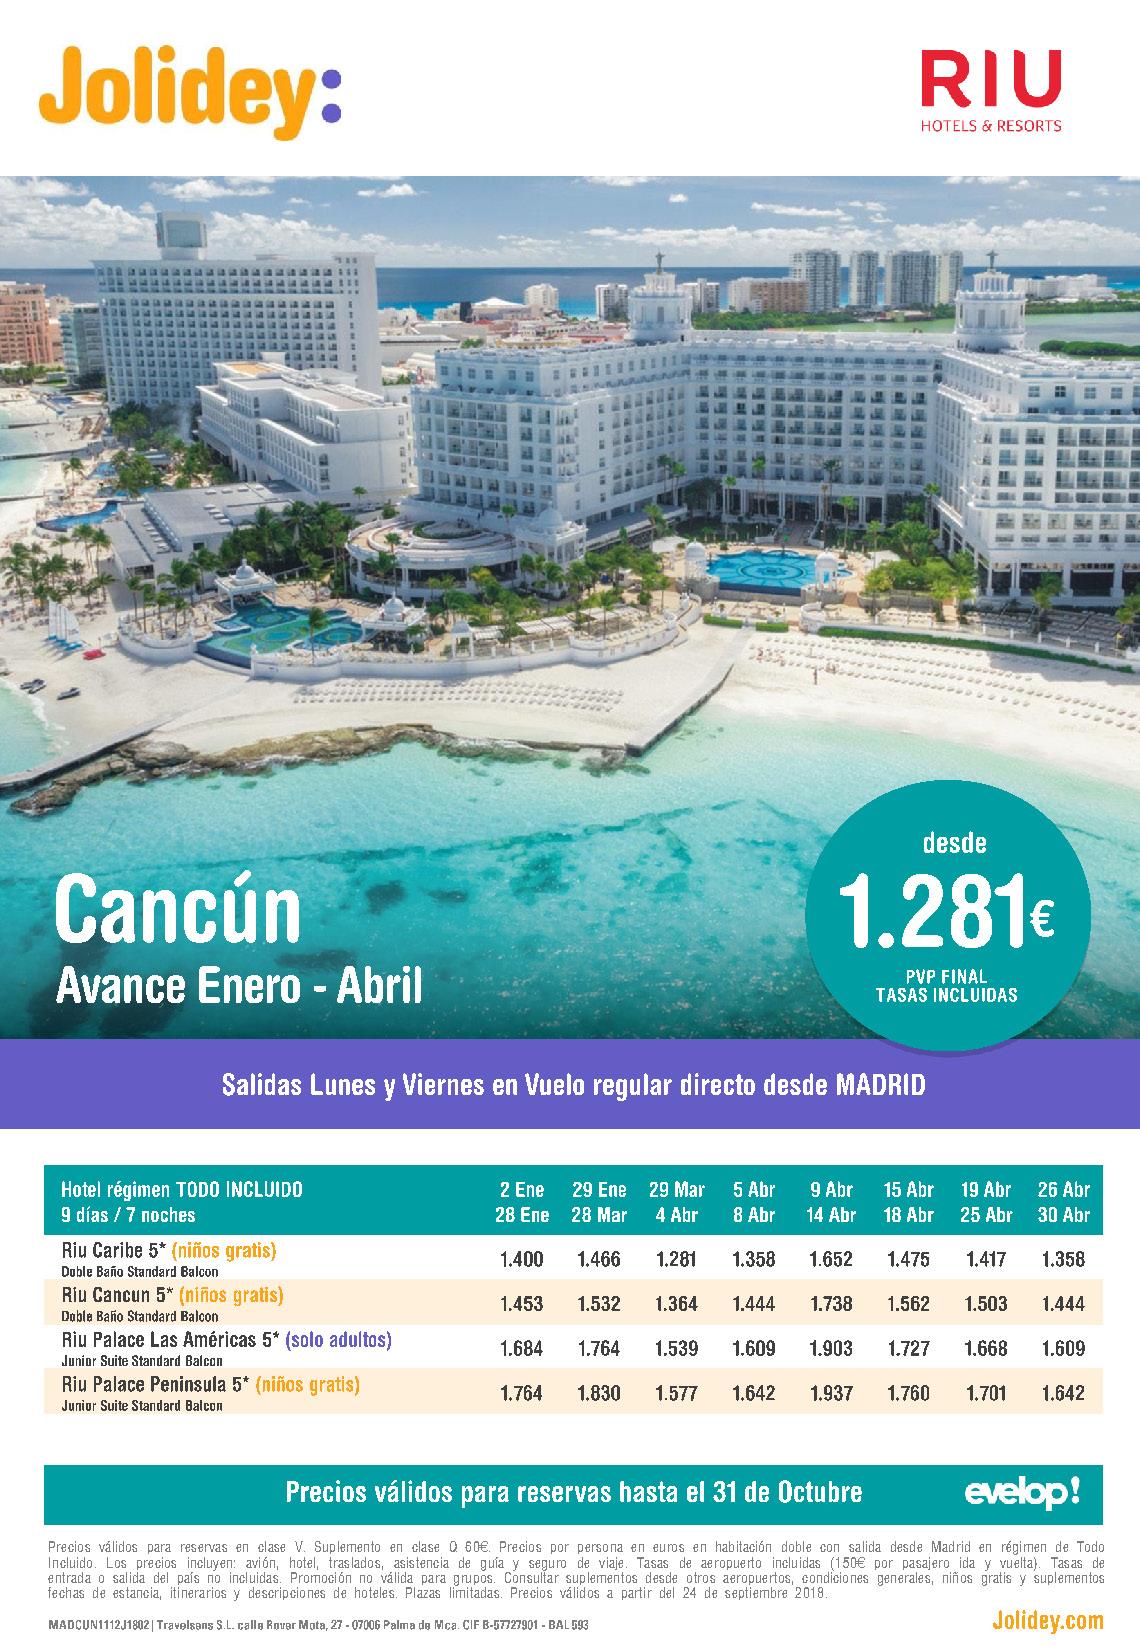 Oferta Jolidey RIU Cancún Venta Anticipada Invierno 2019